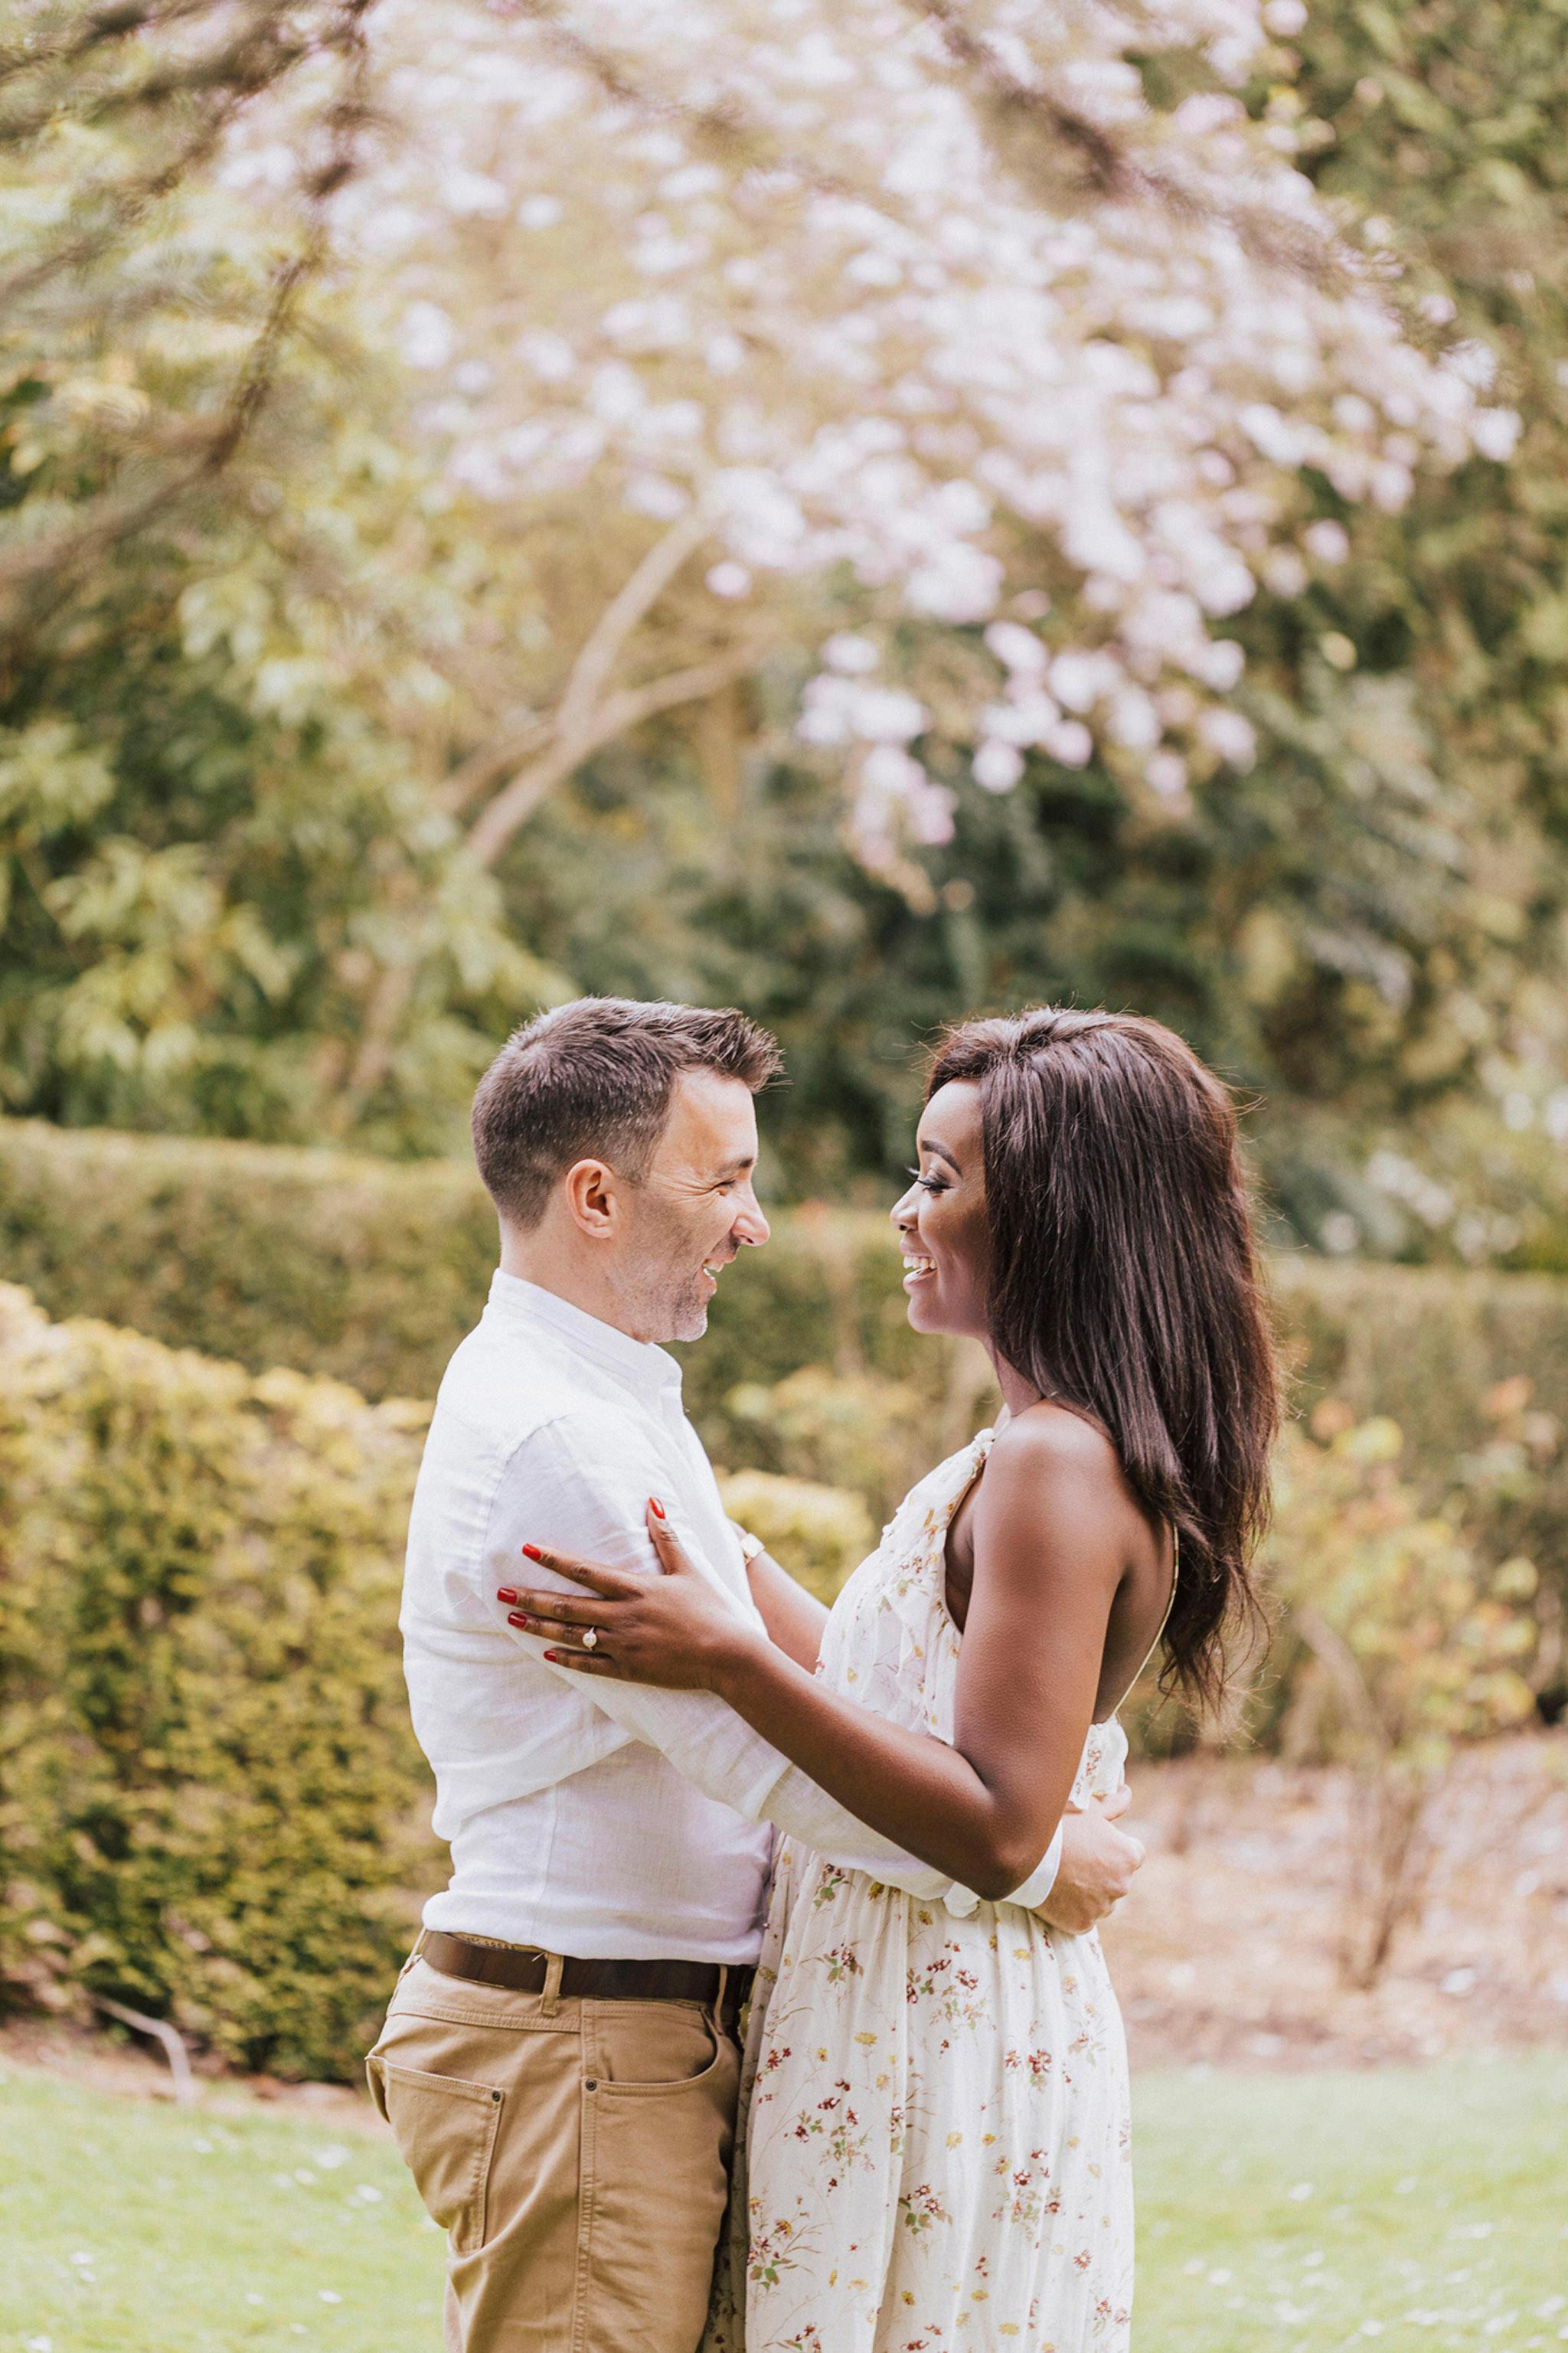 dundee-engagement-wedding-photographer-05.jpg